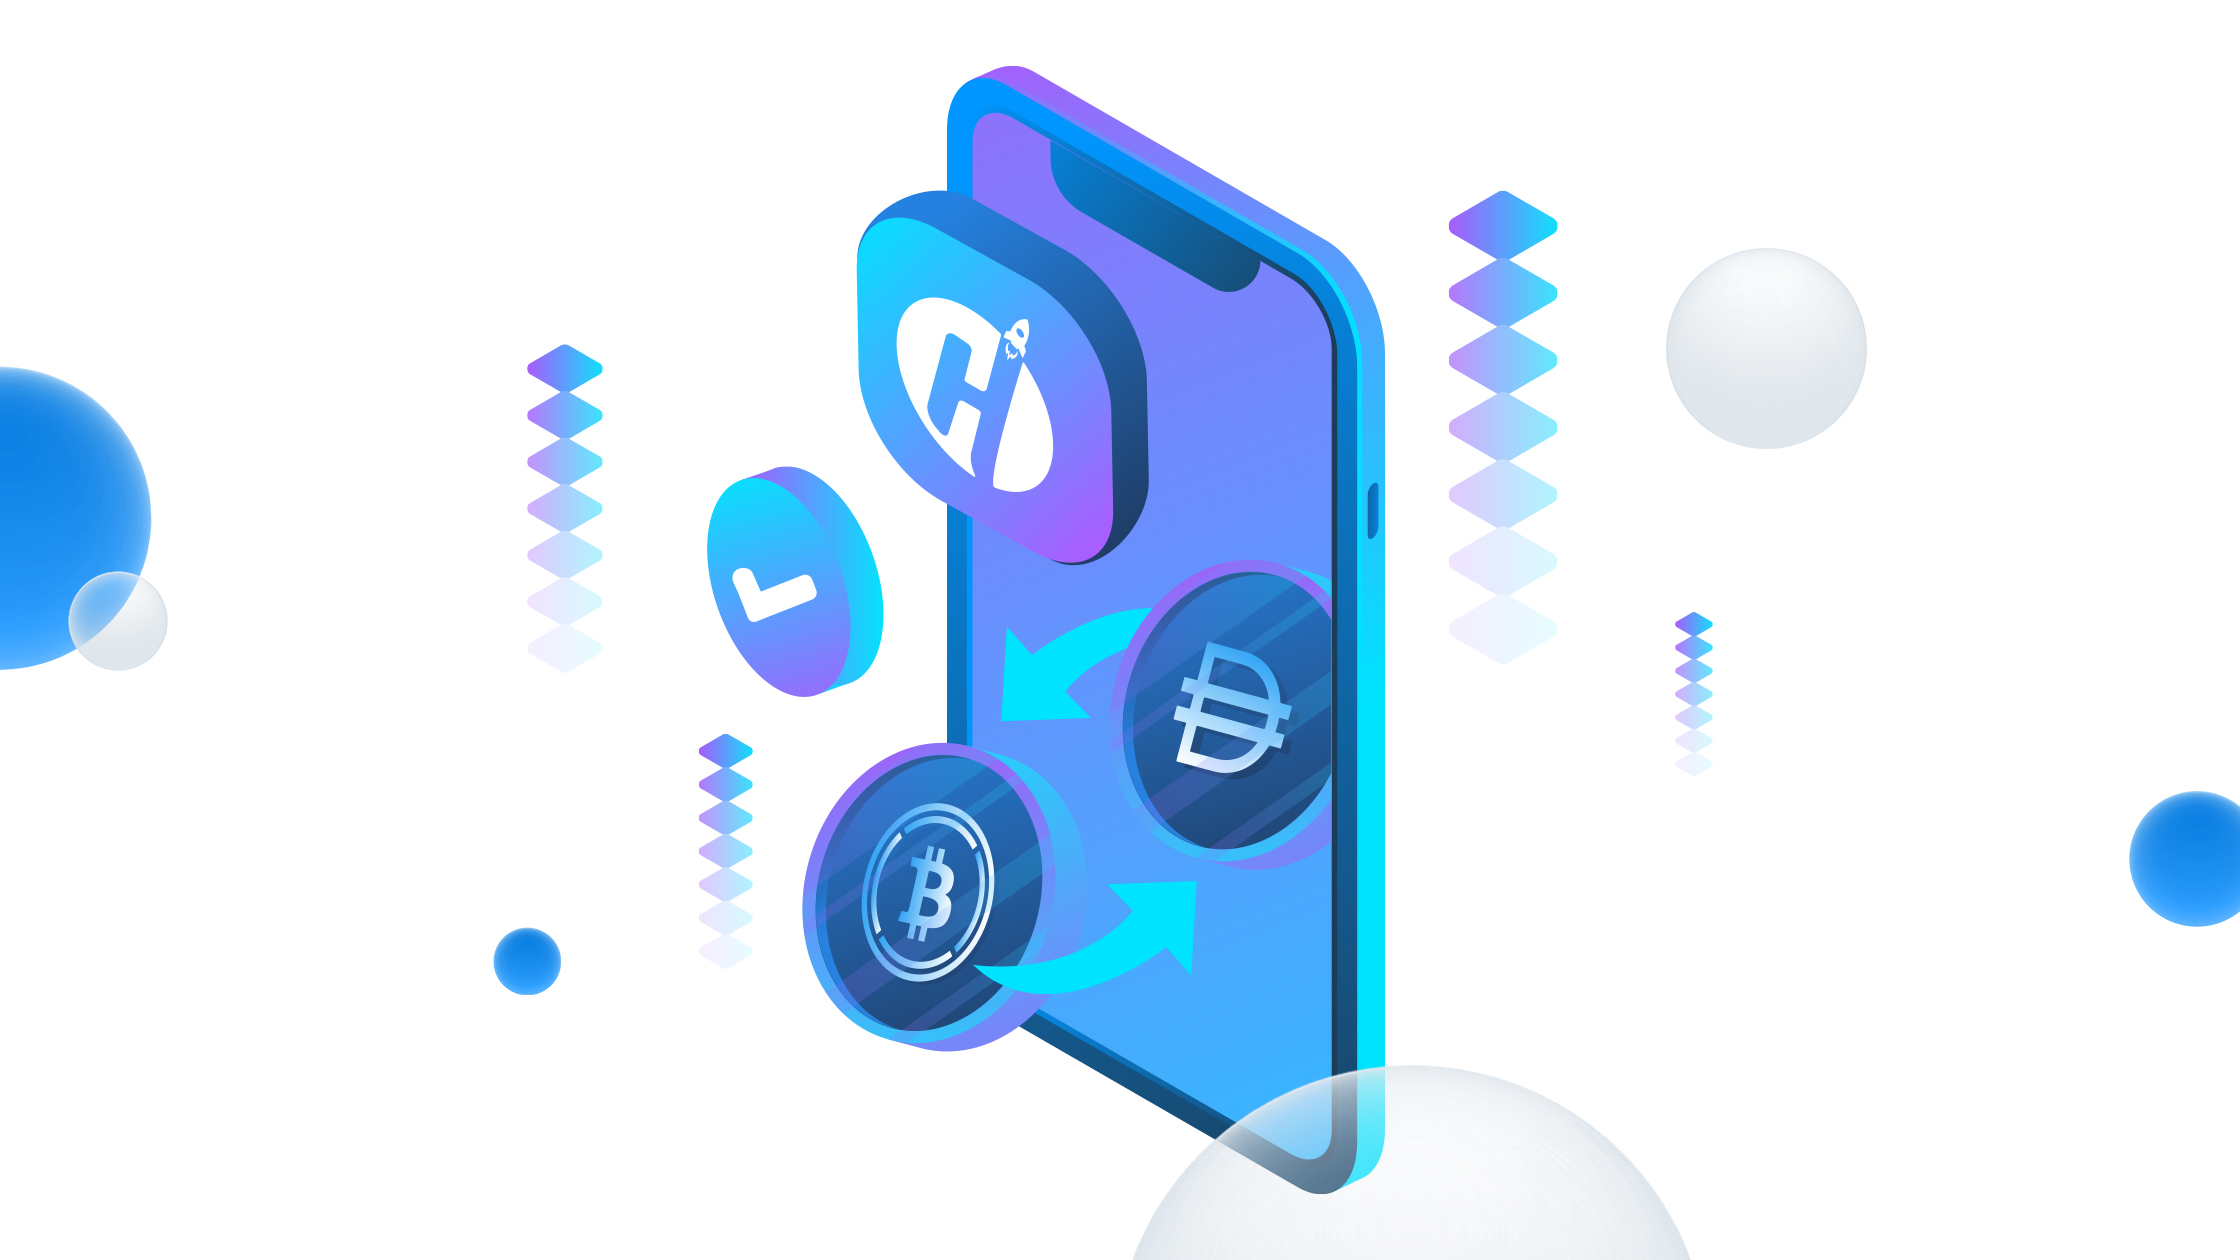 Hodlnaut Releases Token Swap Feature on its iOS App